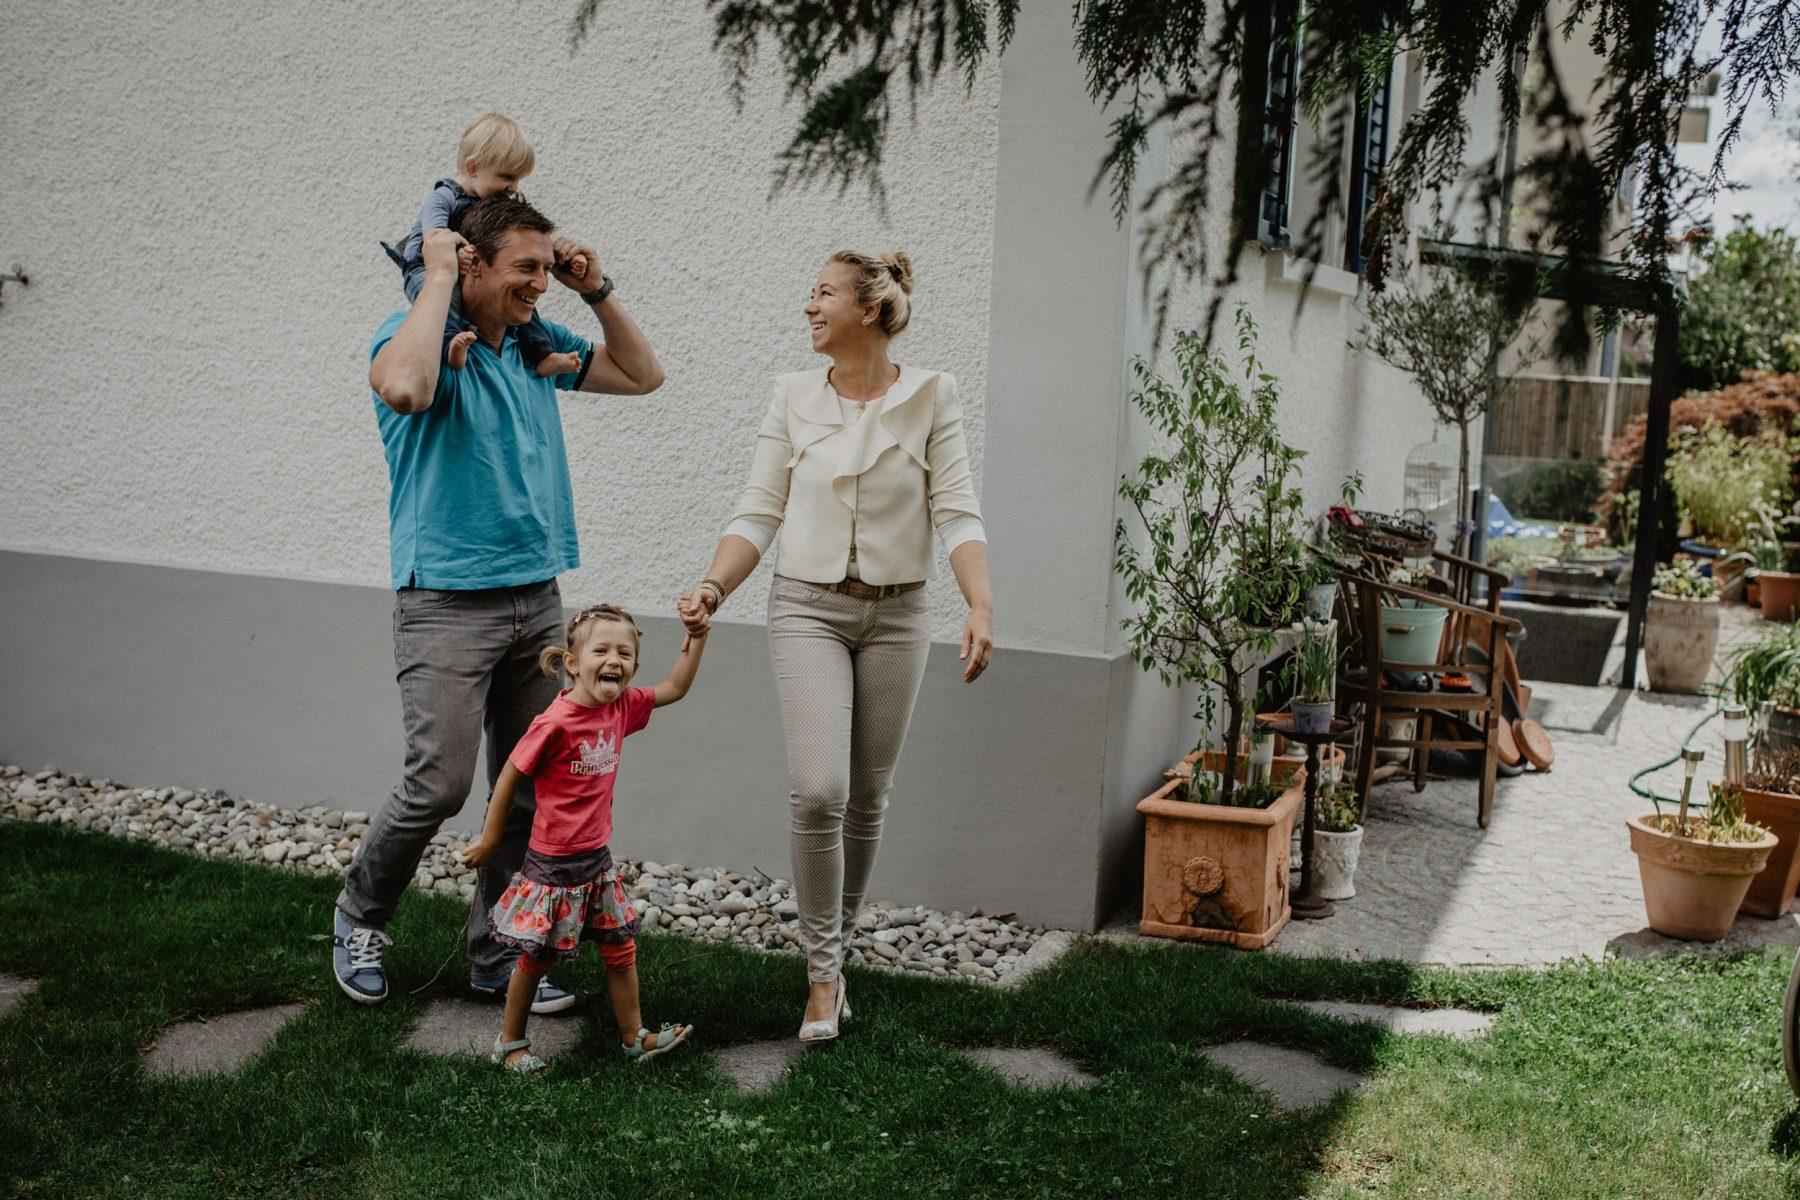 Family familyphotoshooting familie familienfotos familienfotograf happyfamily kinder kinderfotograd lifestyle